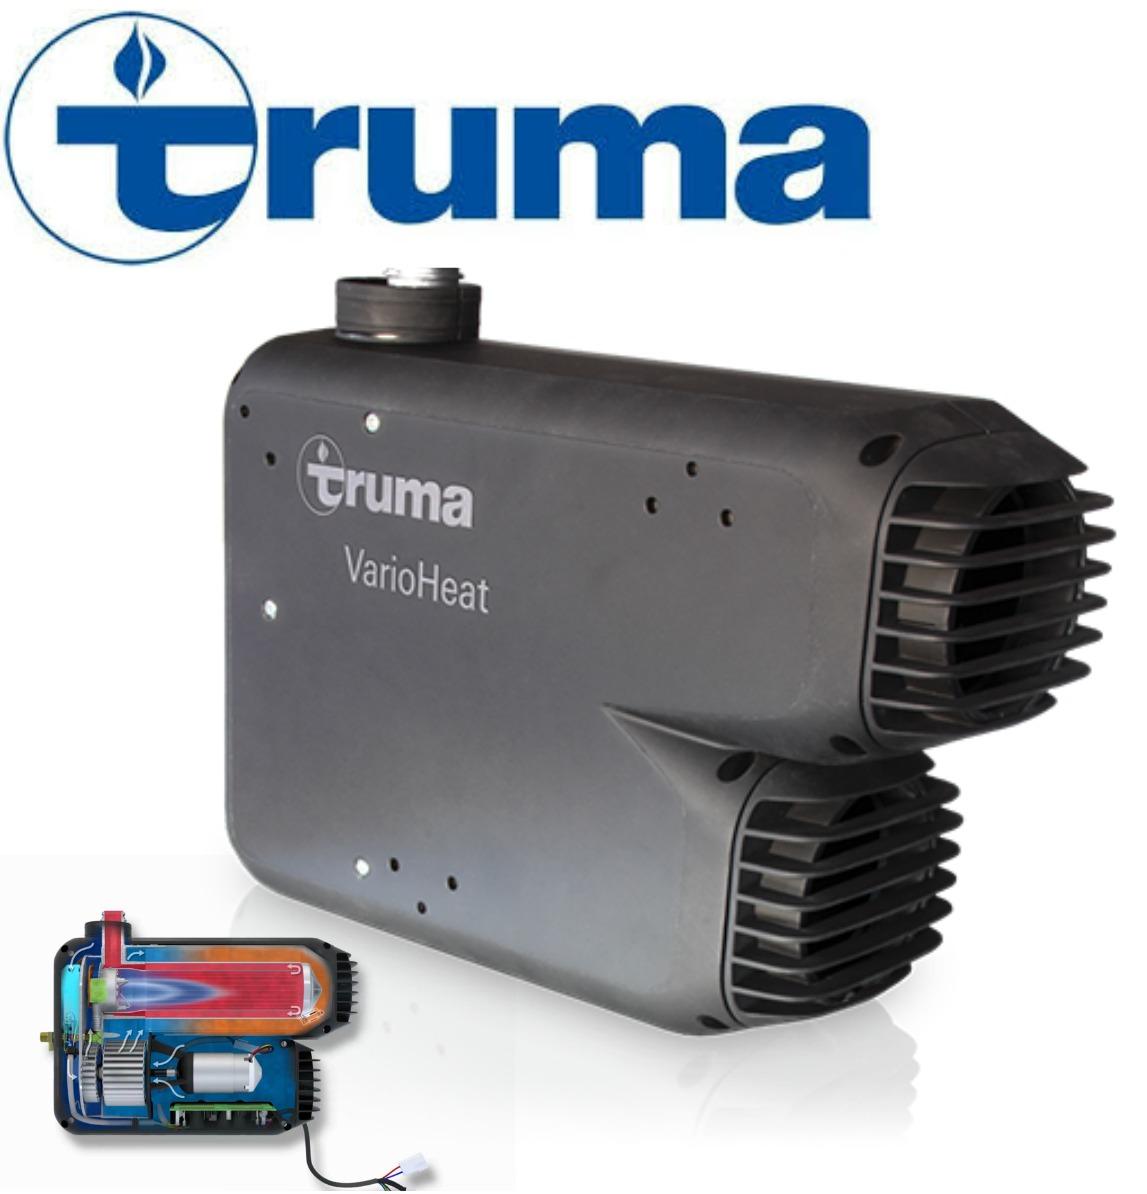 Truma Varioheat Eco Gas Heater Free Freight Suncoast Caravan Service Electrical Wiring Regulations